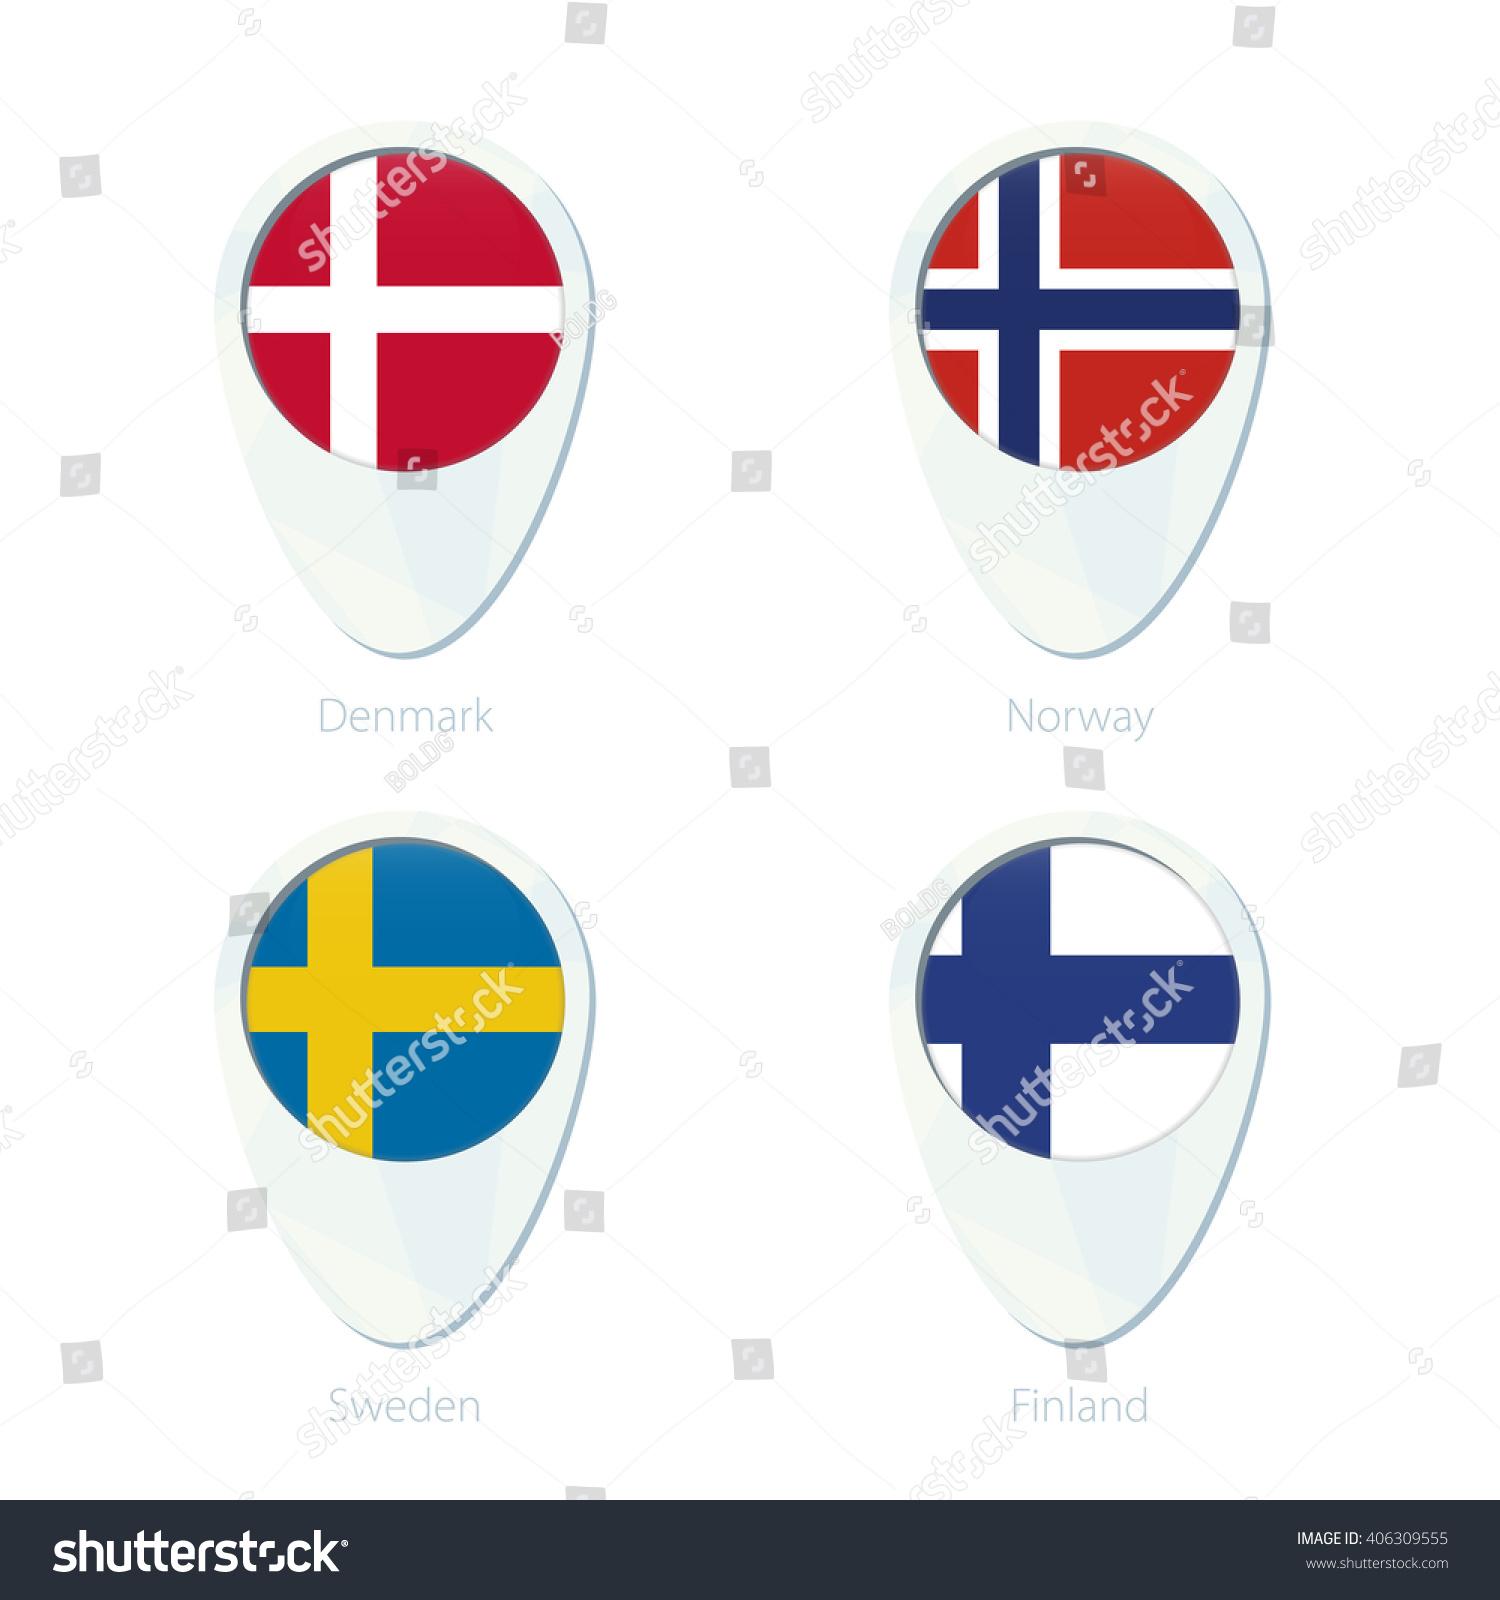 Picture of: Vector De Stock Libre De Regalias Sobre Denmark Norway Sweden Finland Flag Location406309555